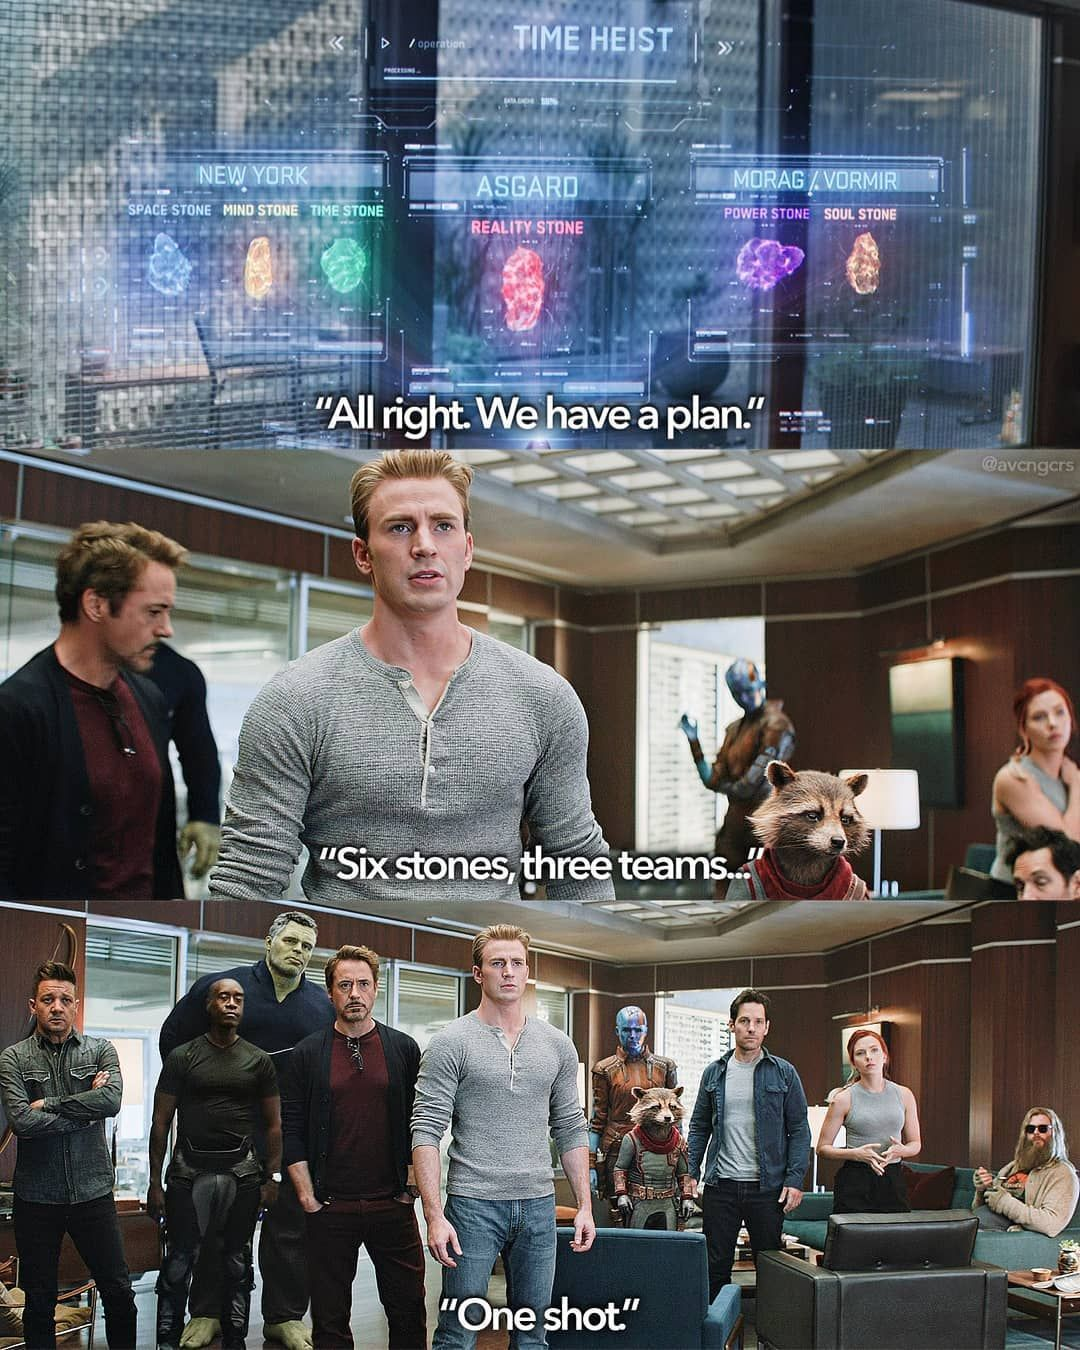 "MARVEL on Instagram: ""😩 —— 「Avengers: Endgame」 • • • • • #marvel #mcu #marvelcinematicuniverse #ironman #captainamerica #thor #hulk #blackwidow #hawkeye…"" - MARVEL on Instagram: ""😩 —— 「Avengers: Endgame」 • • • • • #marvel #mcu #marvel - #Avengers #blackpanthermarvel #blackwidow #capitanamarvel #captainmarvel #captainamerica #ENDGAME #Hawkeye #hulk #Instagram #ironman #Marvel #marvelaesthetic #marvelartwork #marvelavengers #marvelbackground #marvelcake #marvelcartoon #marvelcast #marvelcharacte"